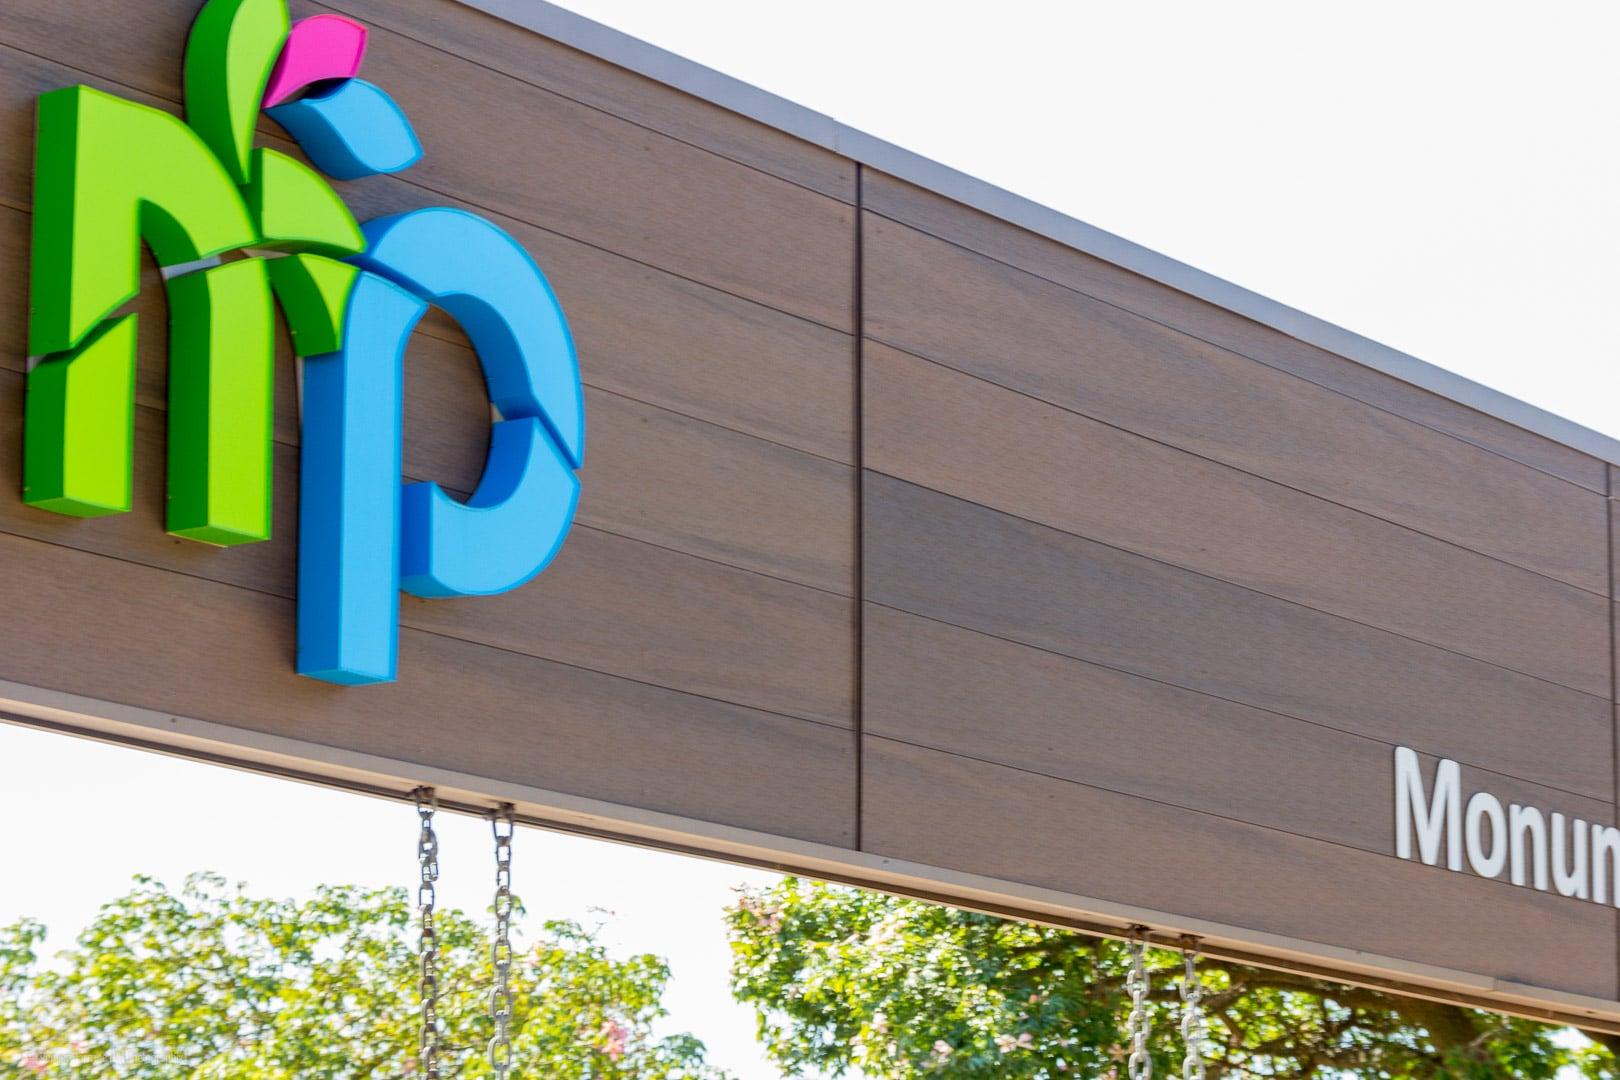 Monument Park Shopping Centre